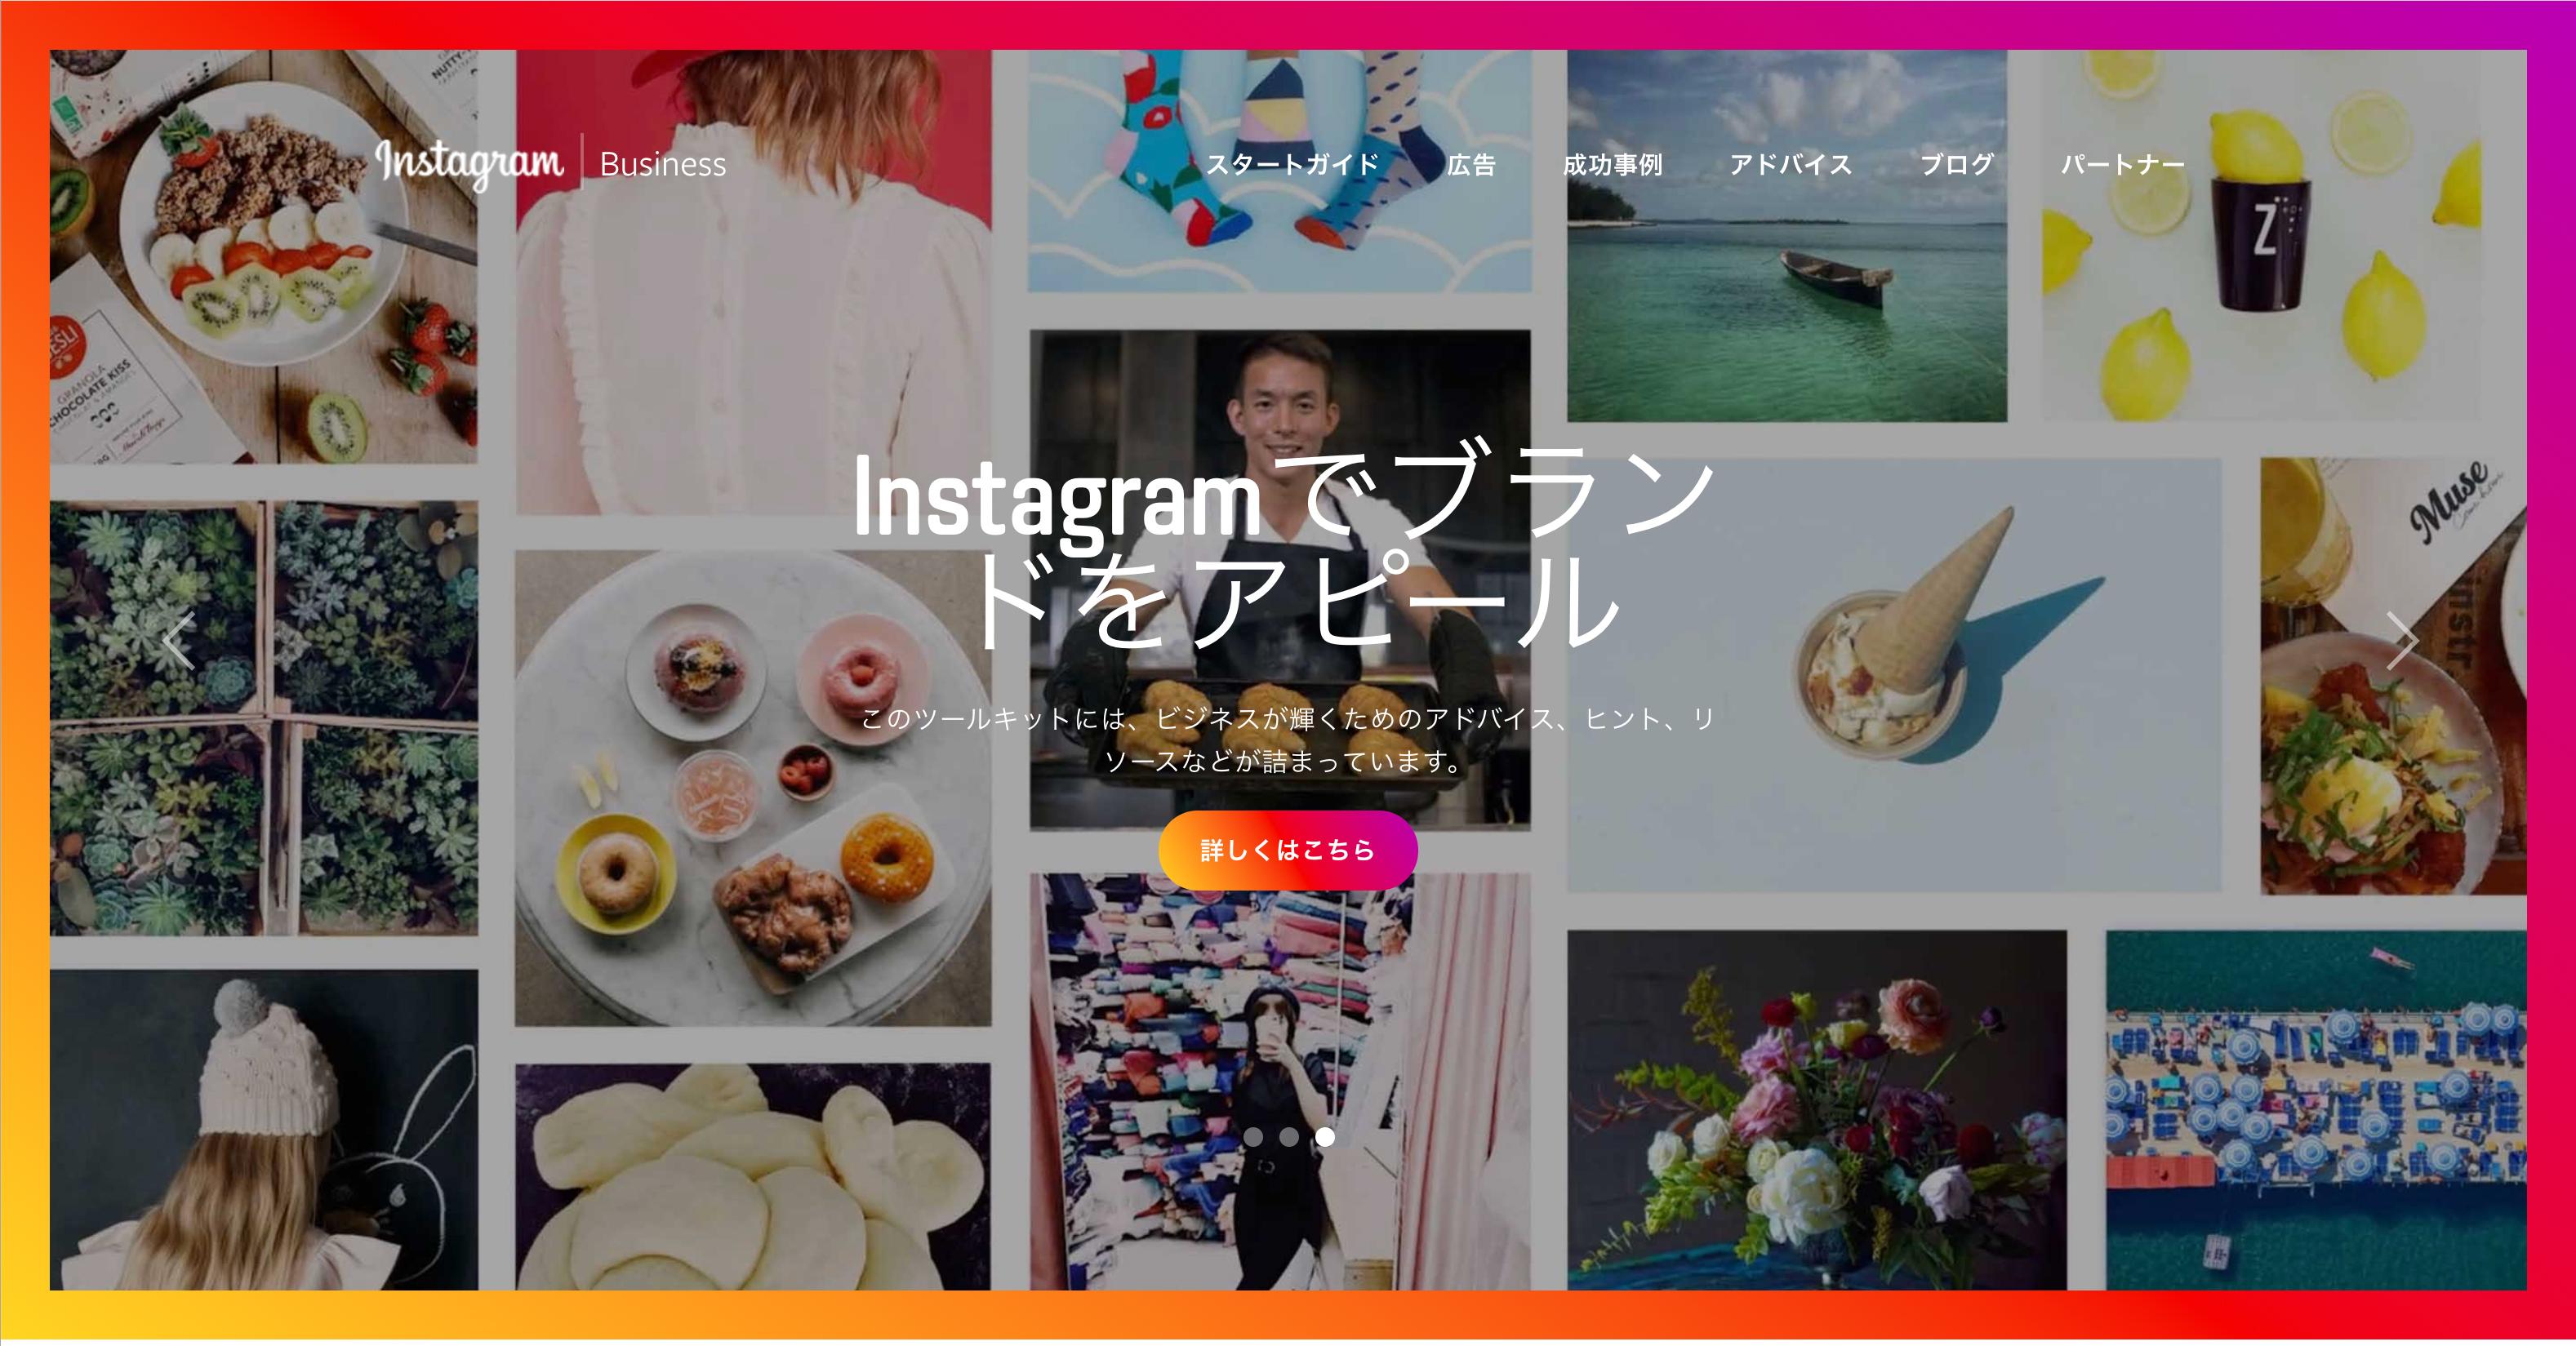 Instagramの公式ホームページ